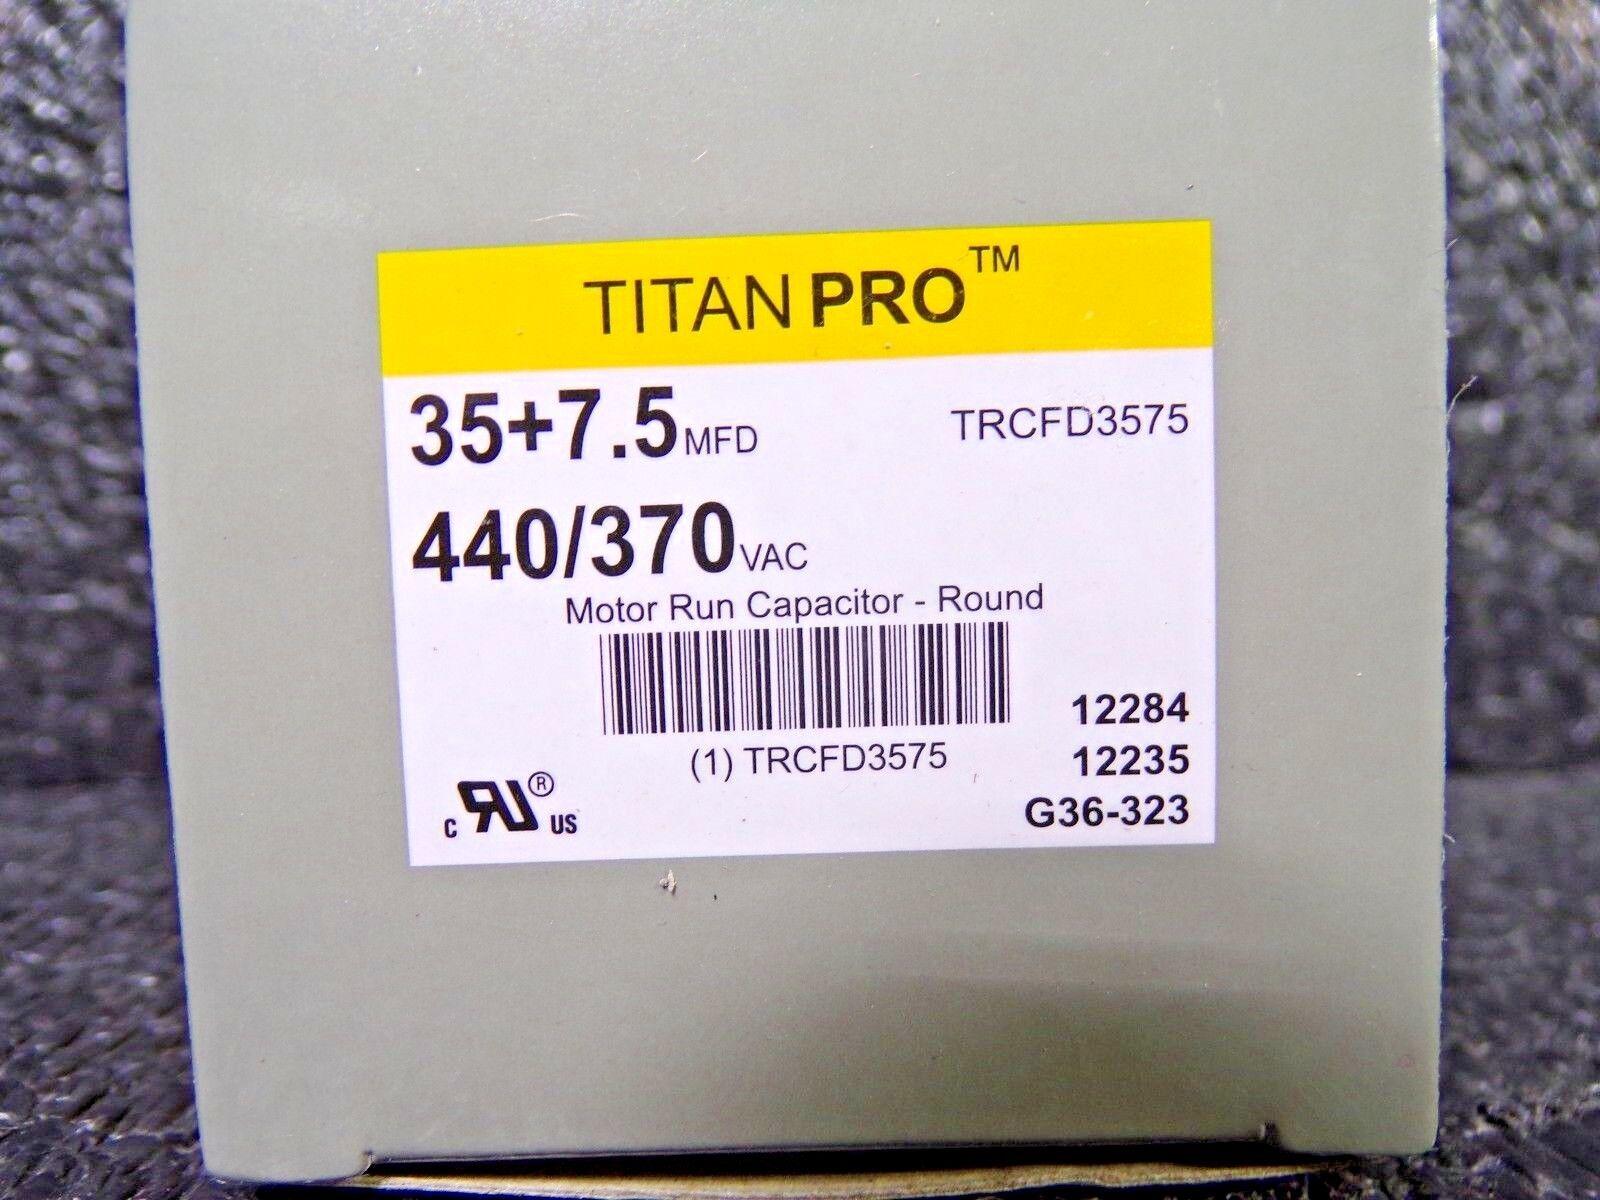 Titan Pro TRCFD3575 35+7.5 MFD 440 370V Round Motor Run Capacitor K